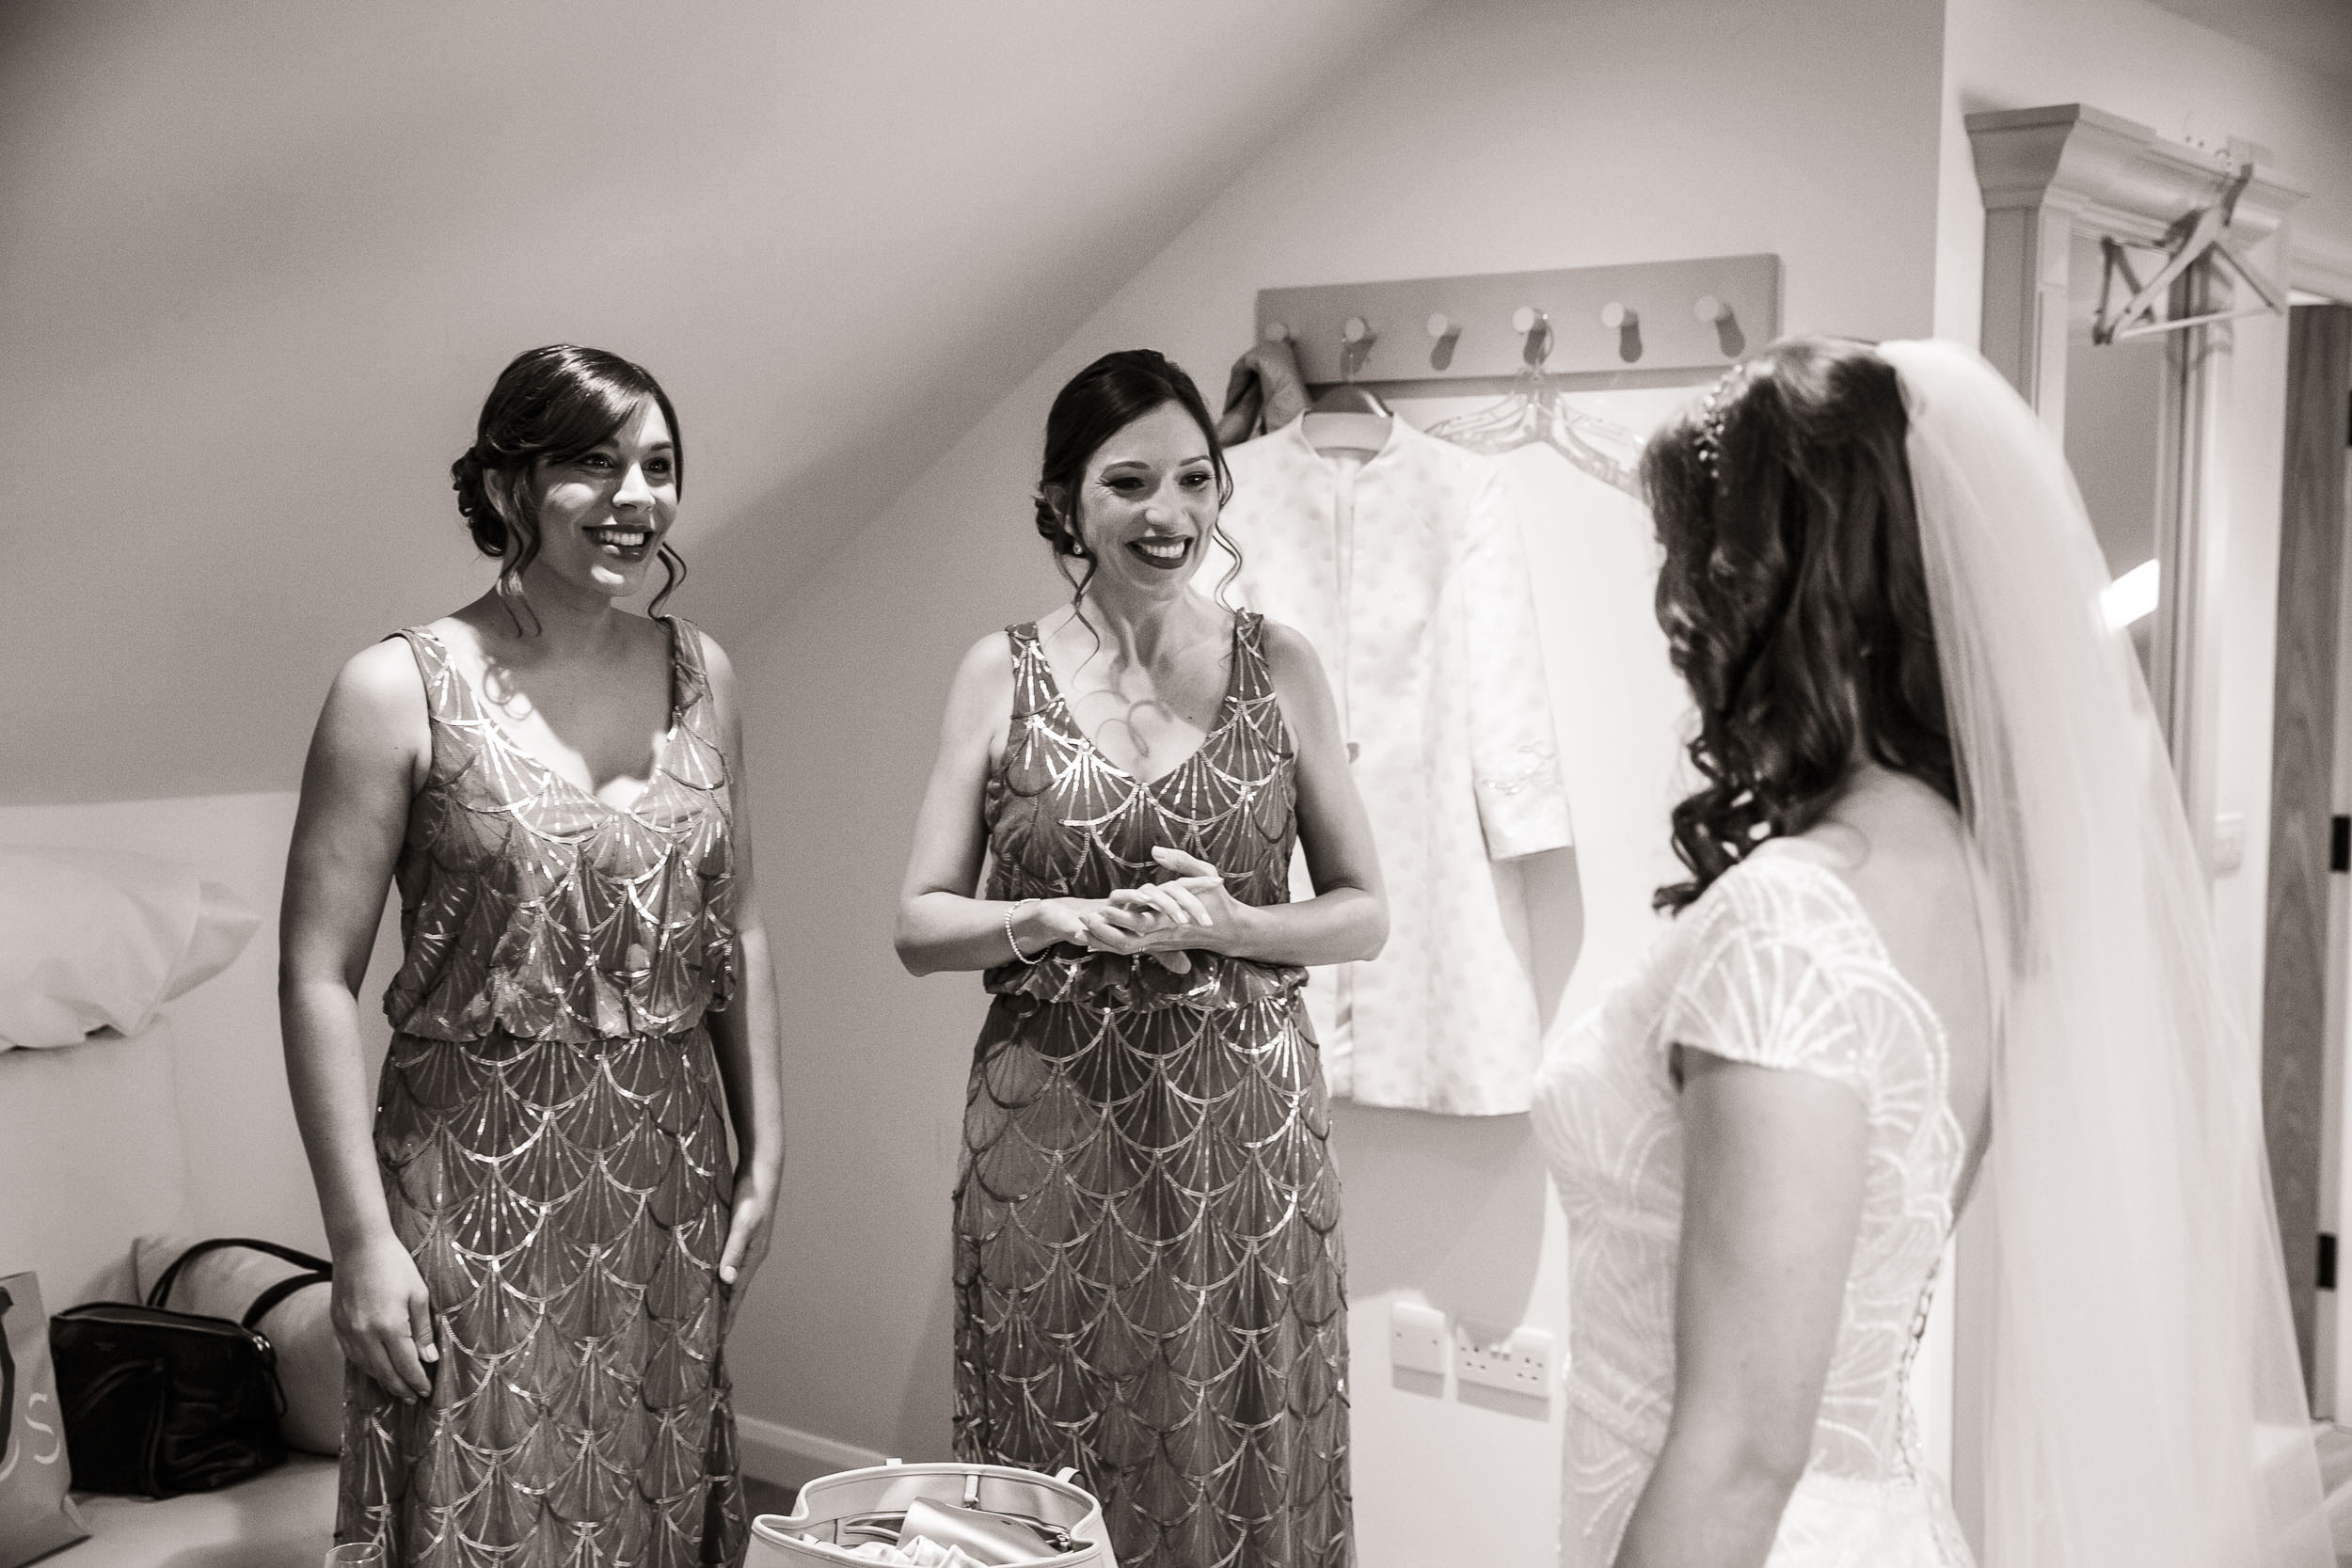 micklefield-hall-wedding-photographer 015.jpg